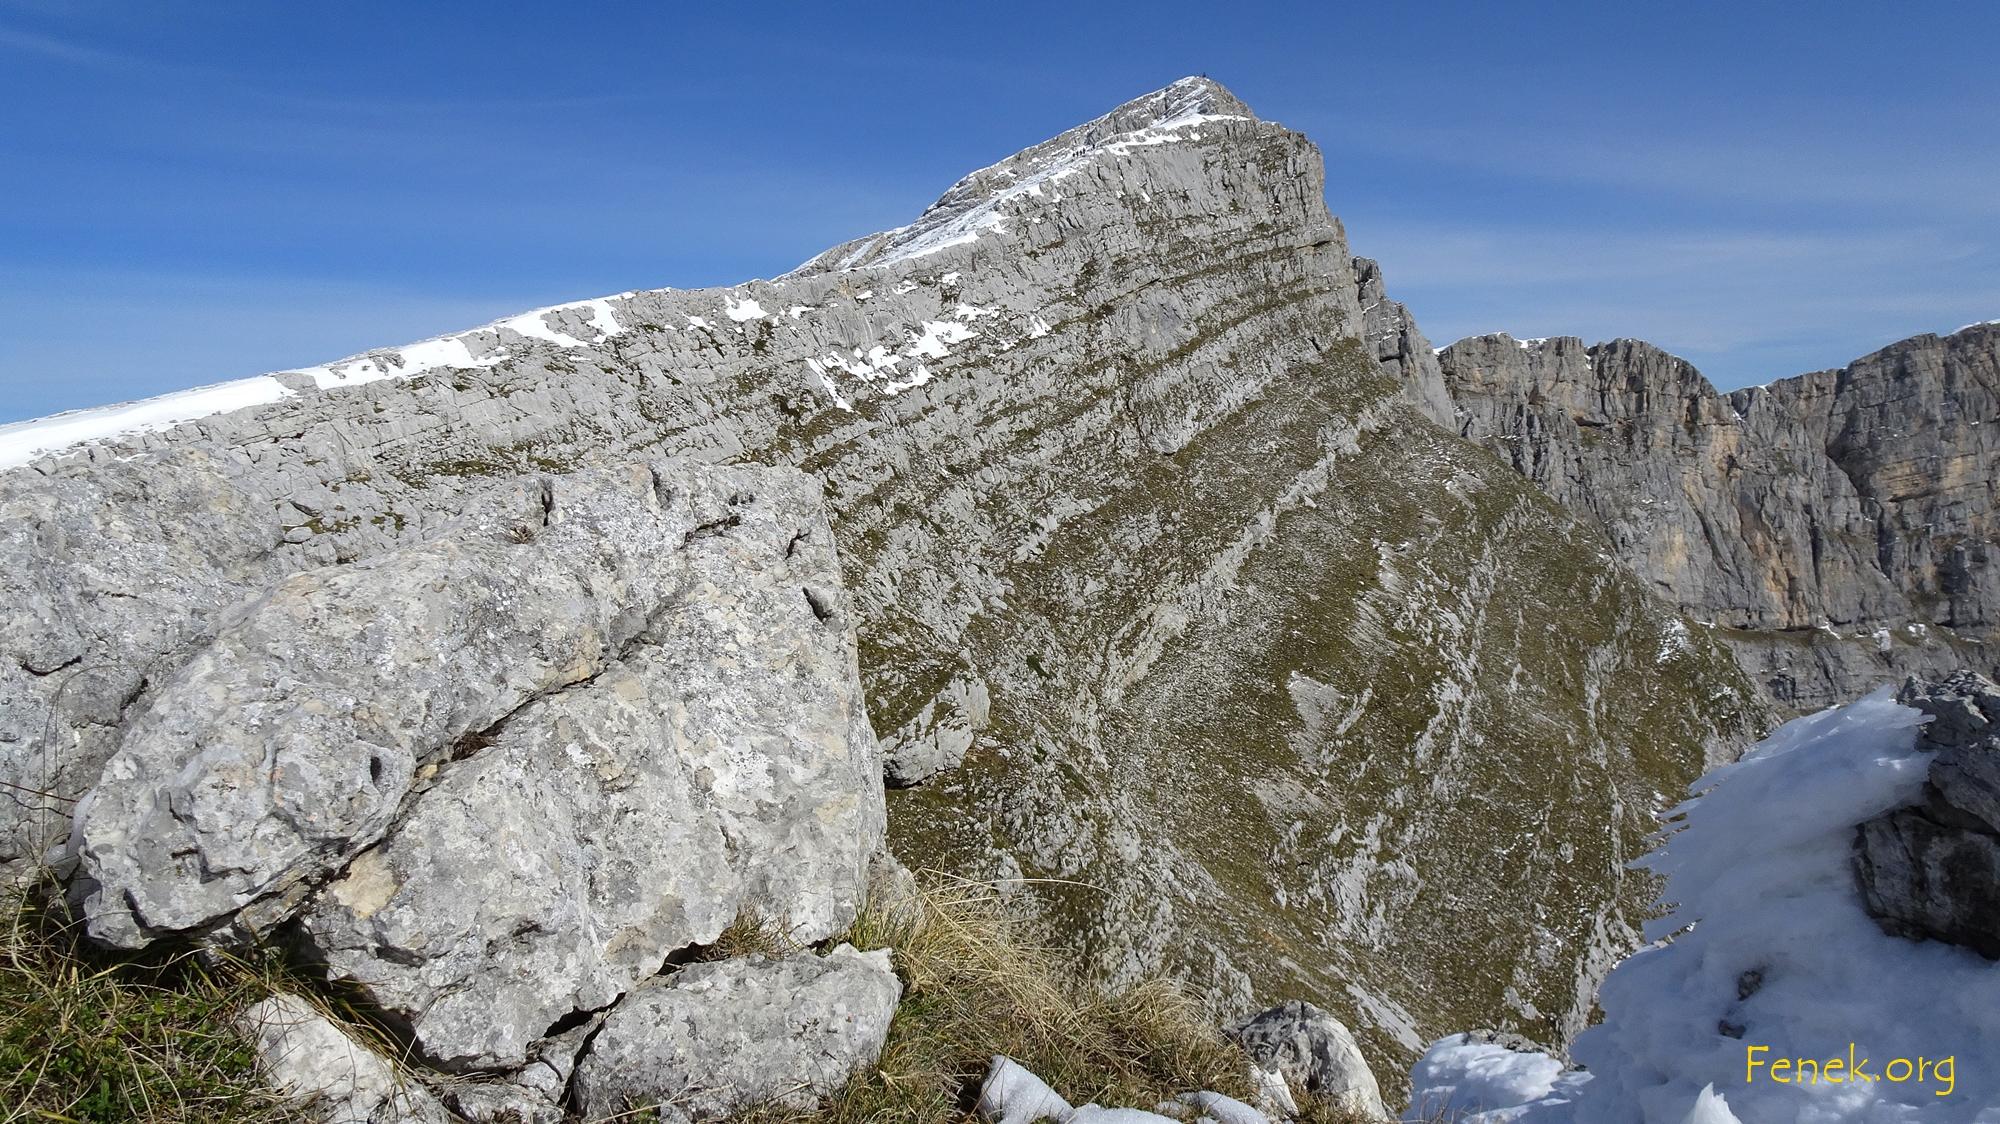 der kurze Grat zum Gipfel...